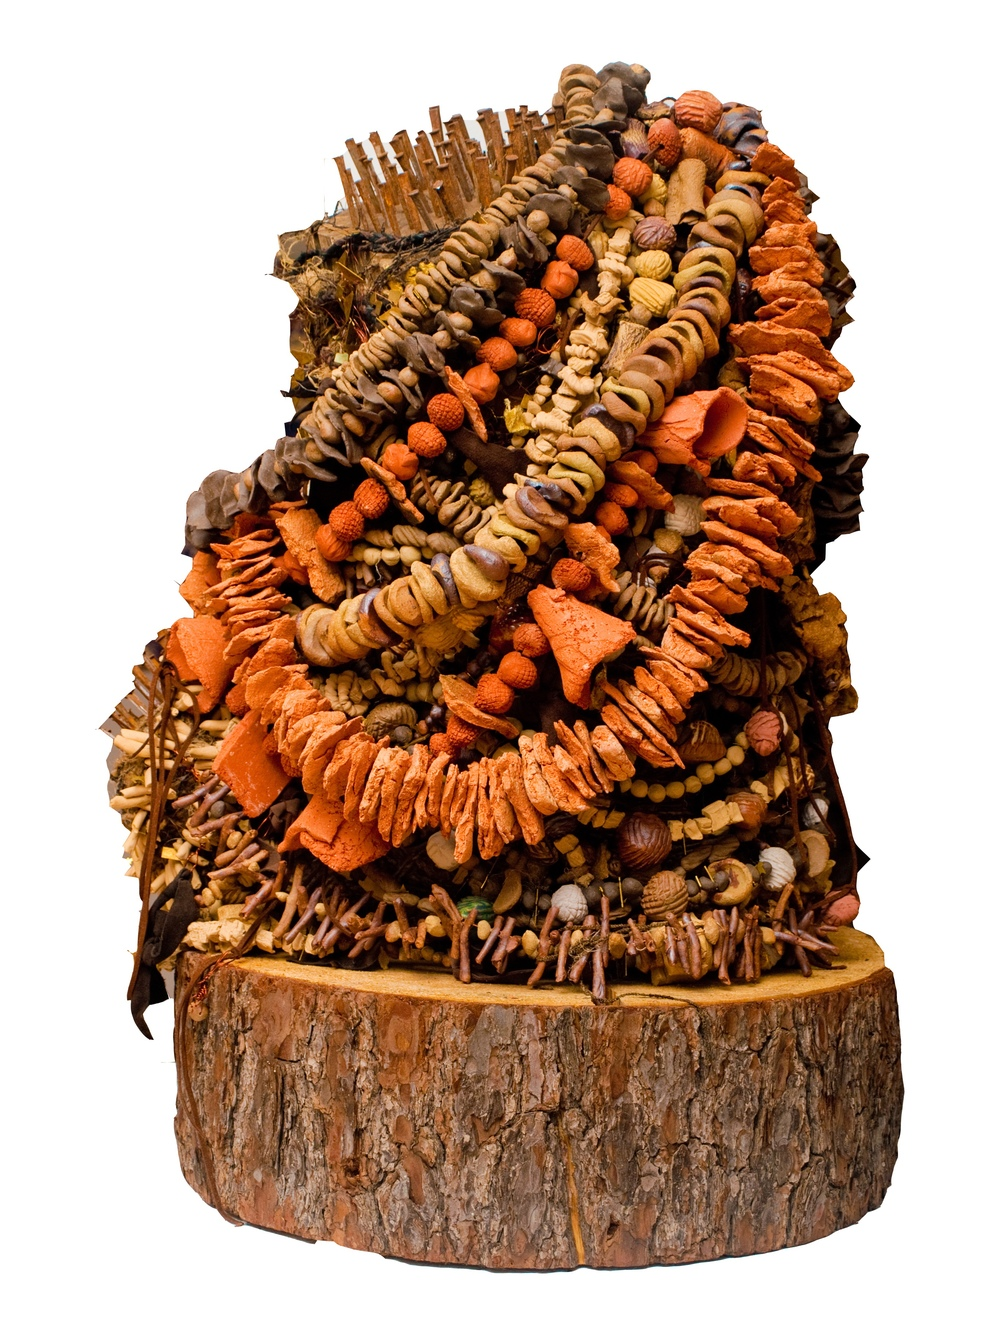 ©Offering III High-fire ceramic mixed media sculpture by Shelita Birchett Benash, 2015.